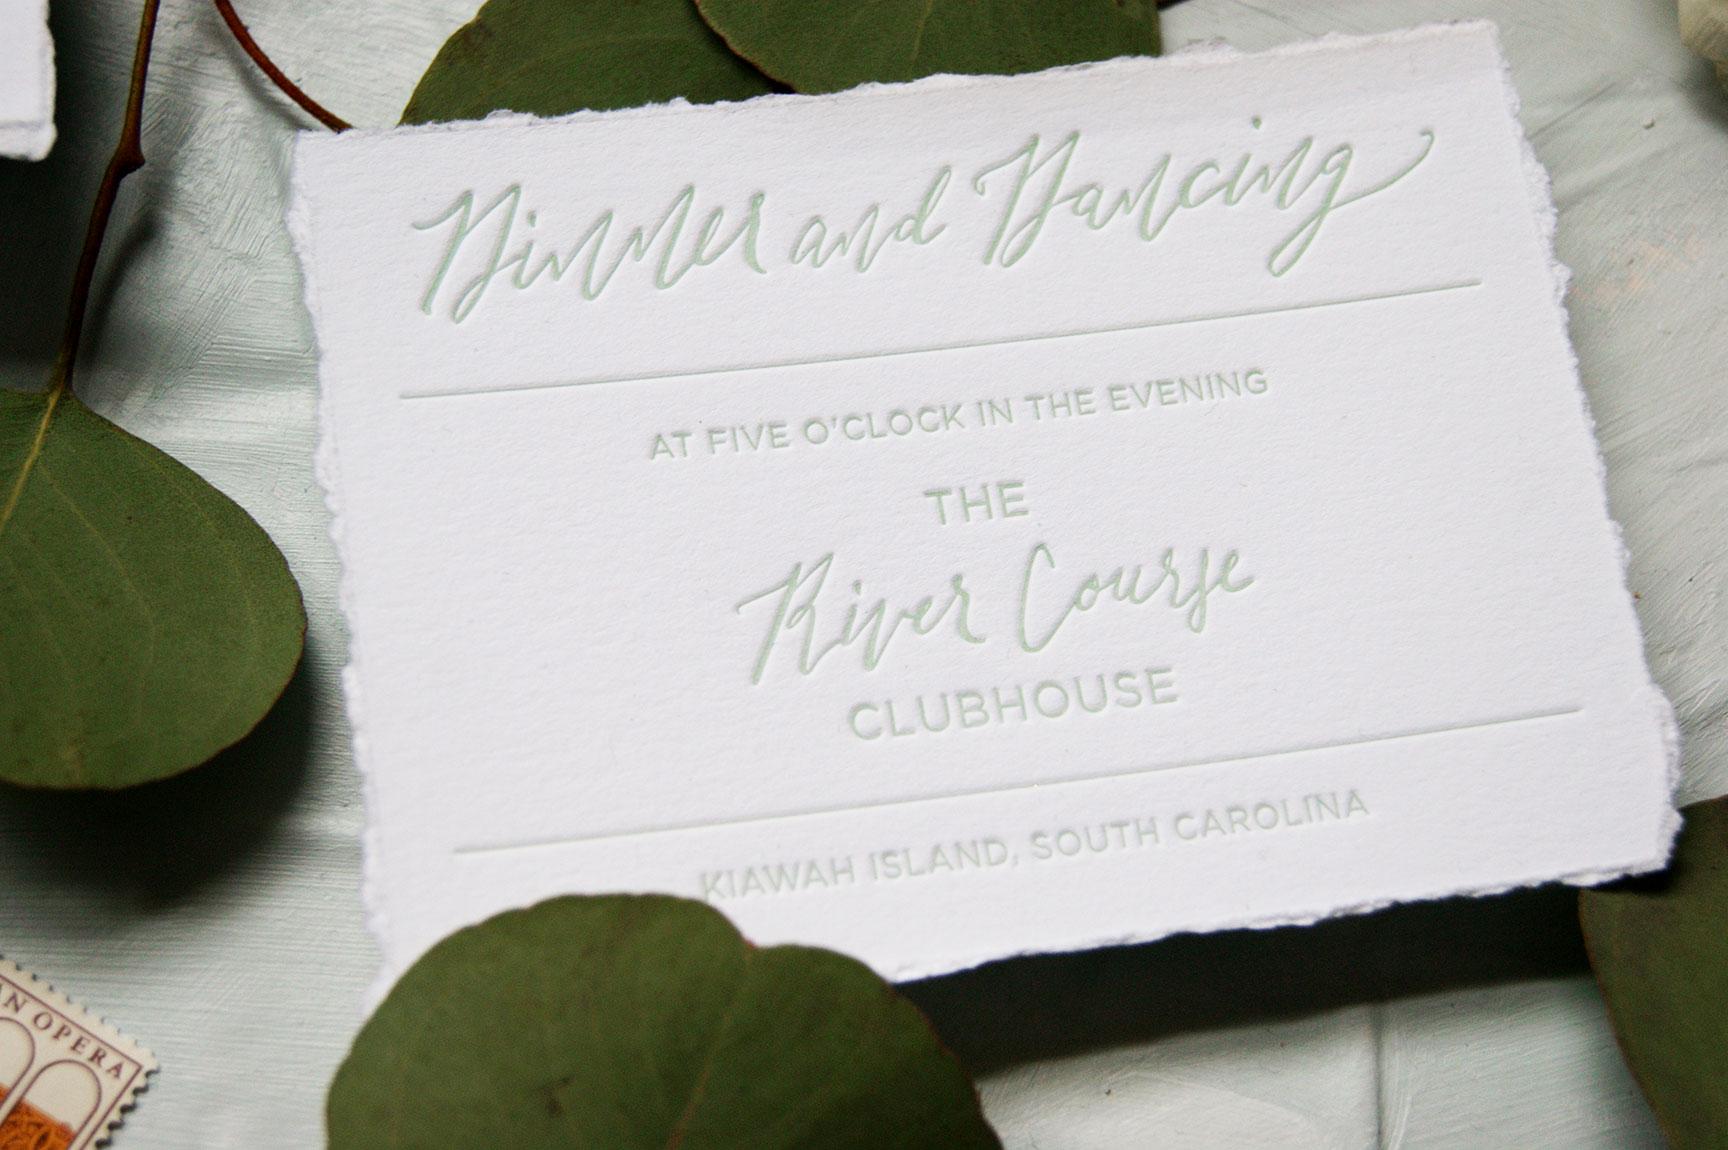 Kiawah Island Dinner and Dancing Card